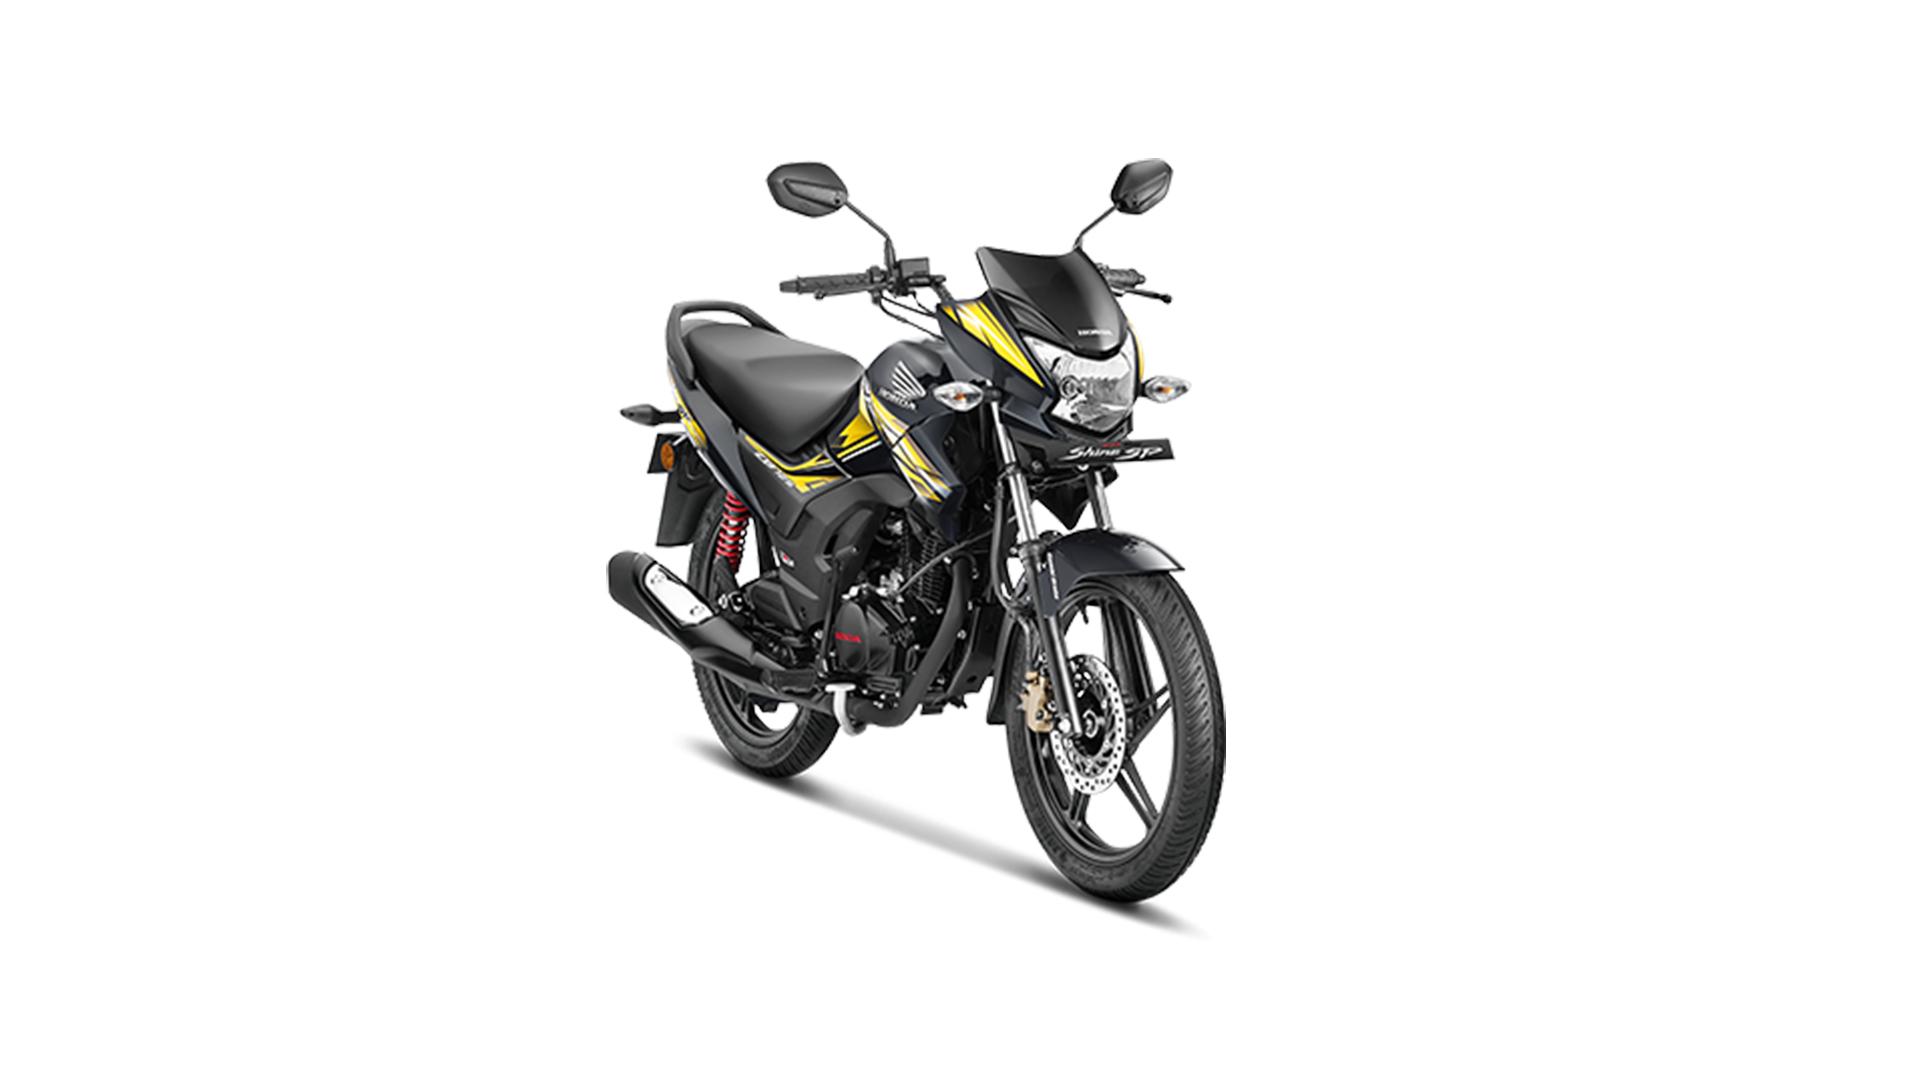 Honda Cb Shine Sp 2018 Price Mileage Reviews Specification